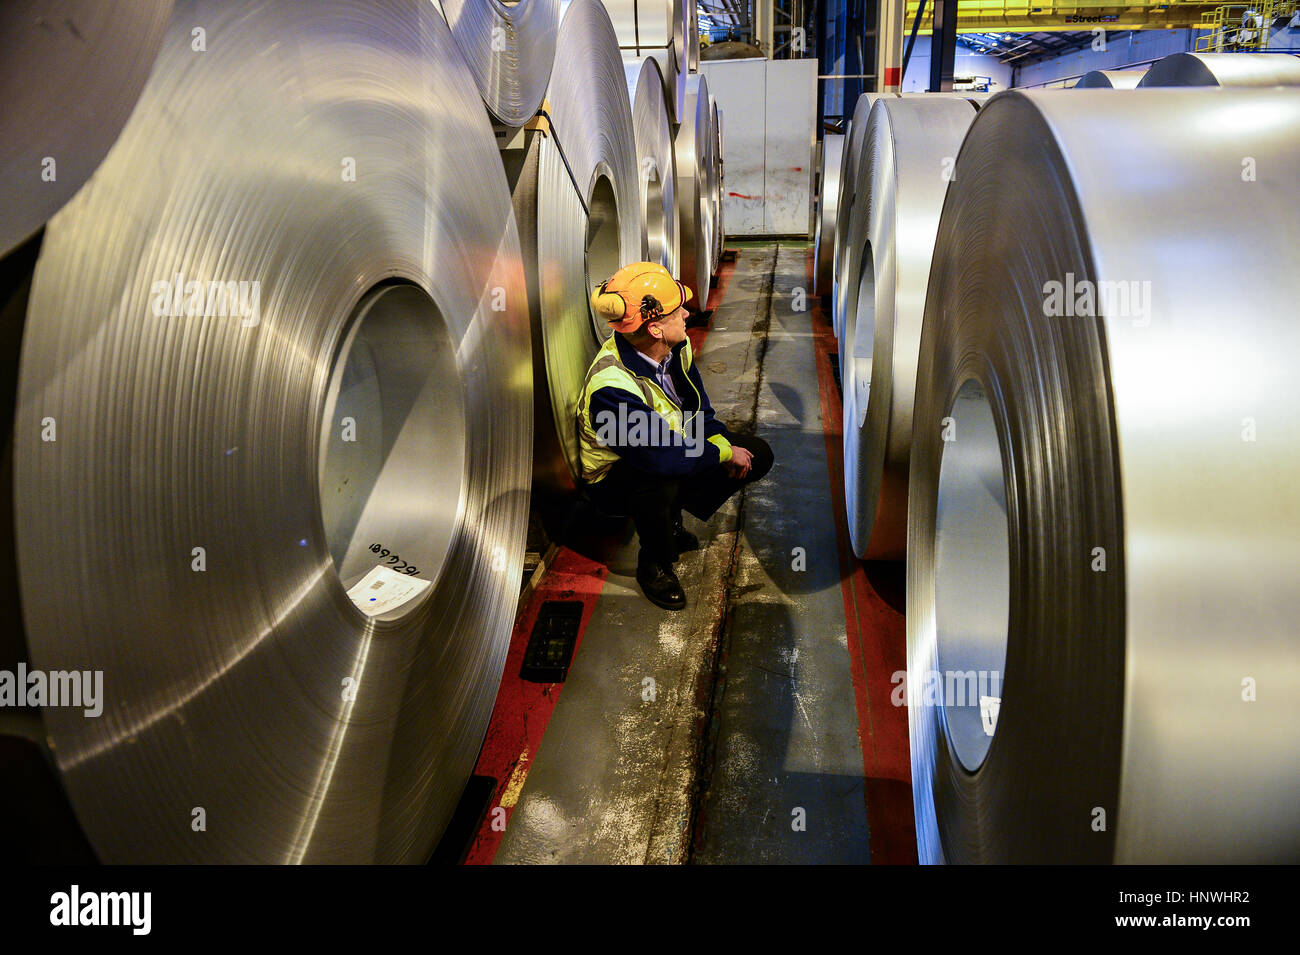 Tata Steel Worker Stock Photos & Tata Steel Worker Stock Images - Alamy